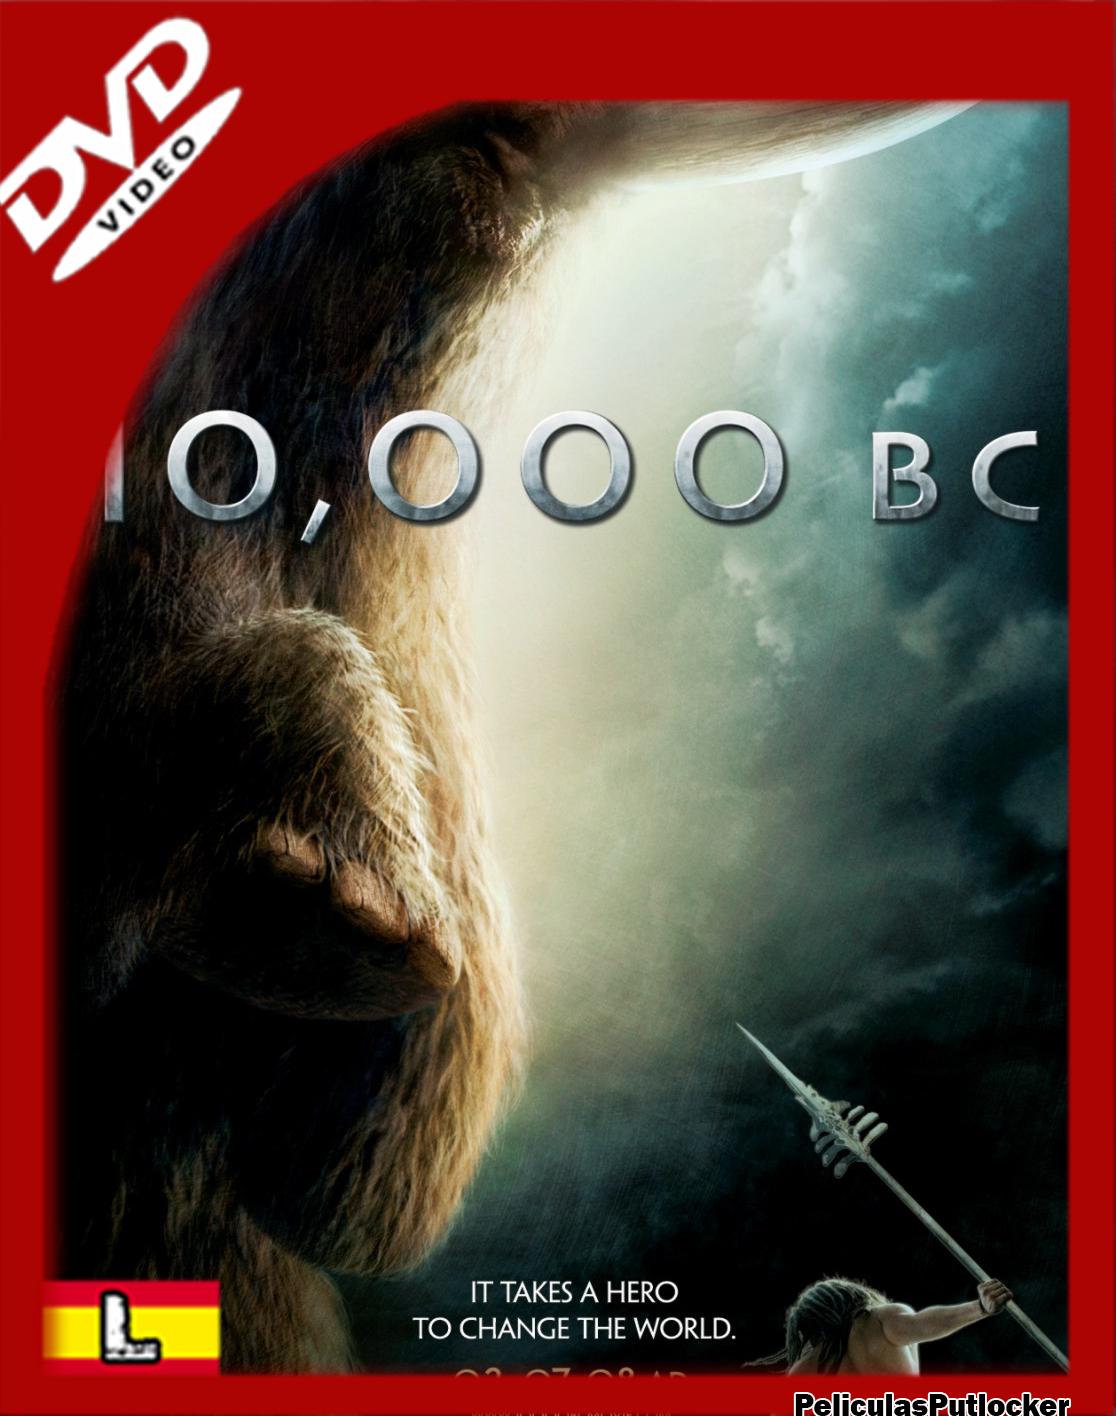 10,000 AC [DVDRip][Latino][MG-FD]